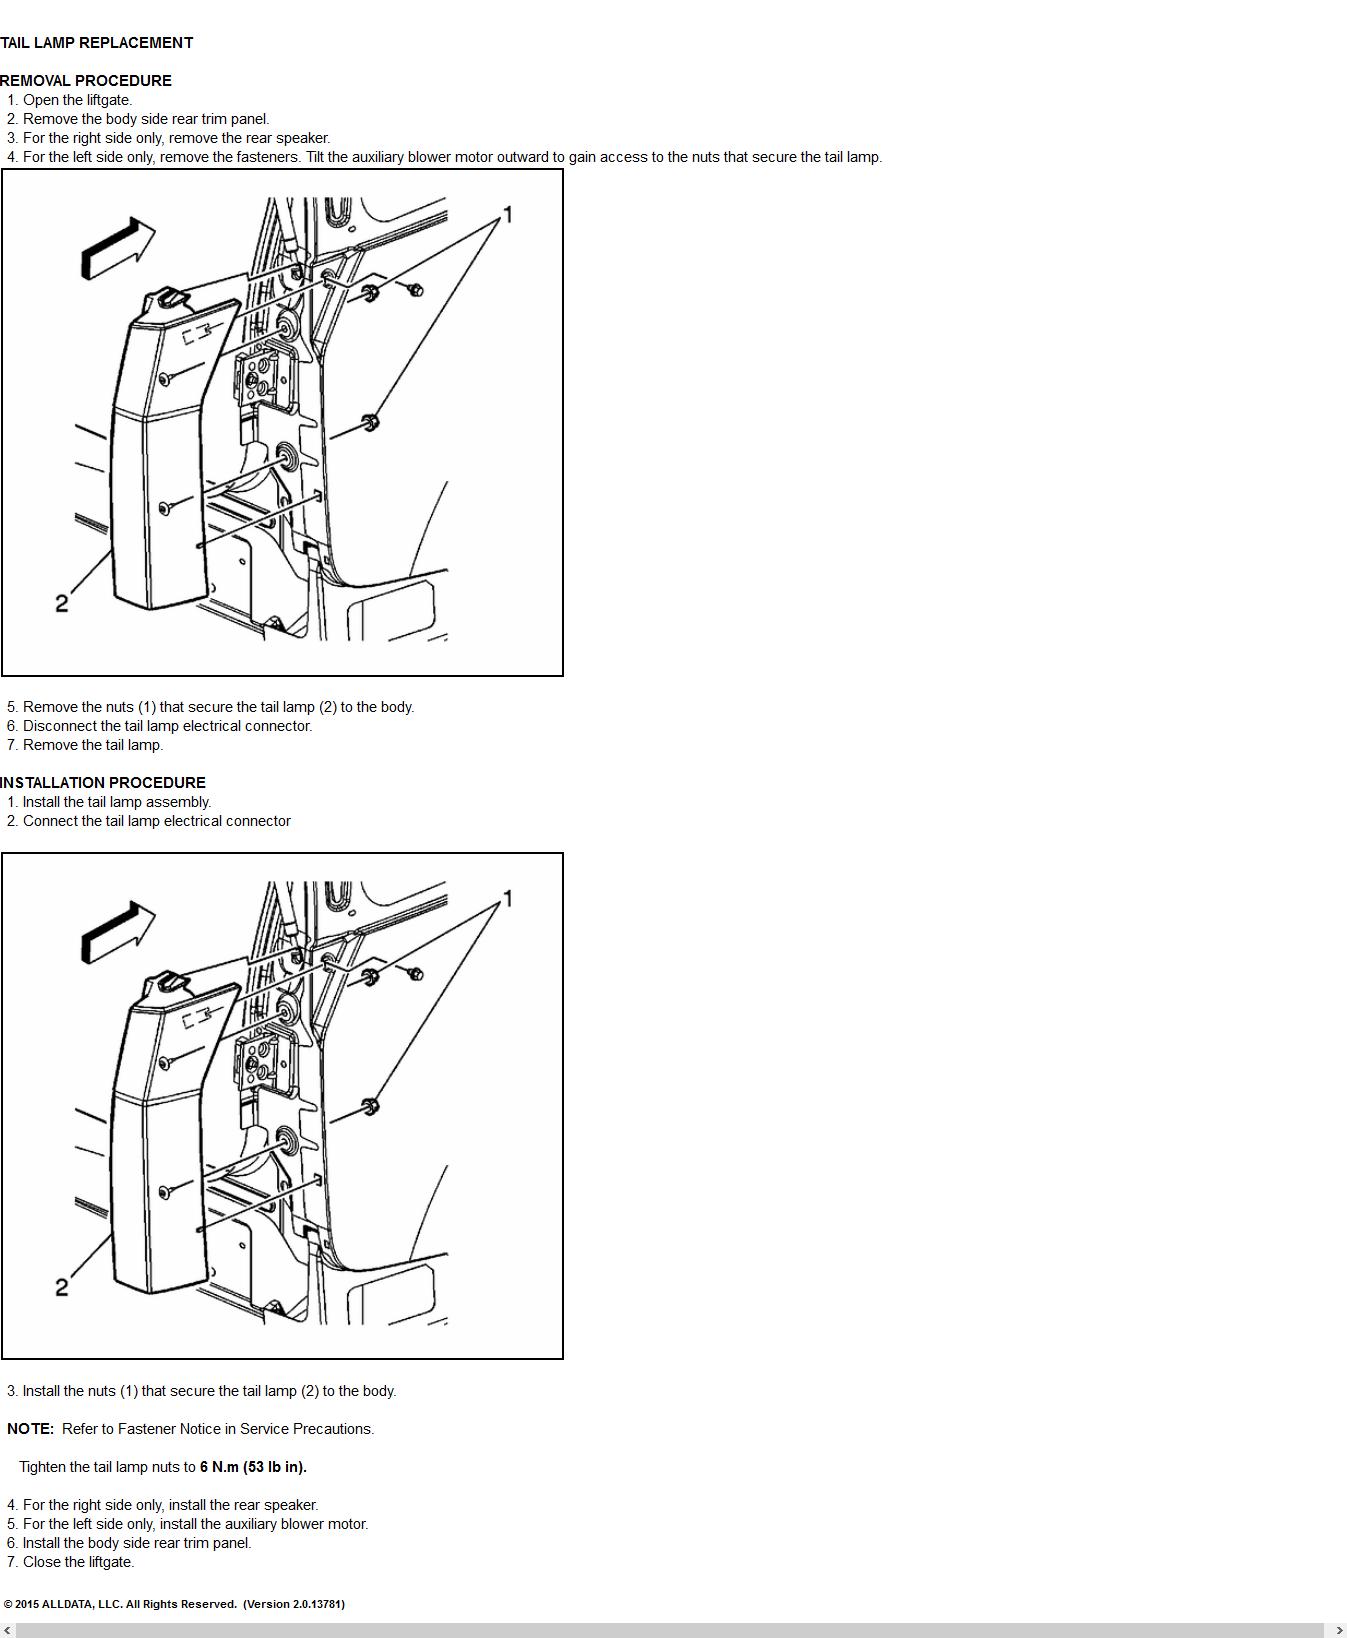 cadillac srx 2008 tail light wiring diagram 2008 chrysler sebring cadillac srx i m trying to replace a rear tail light on my 2006 cadillac srx 2007 cadillac srx wiring diagram